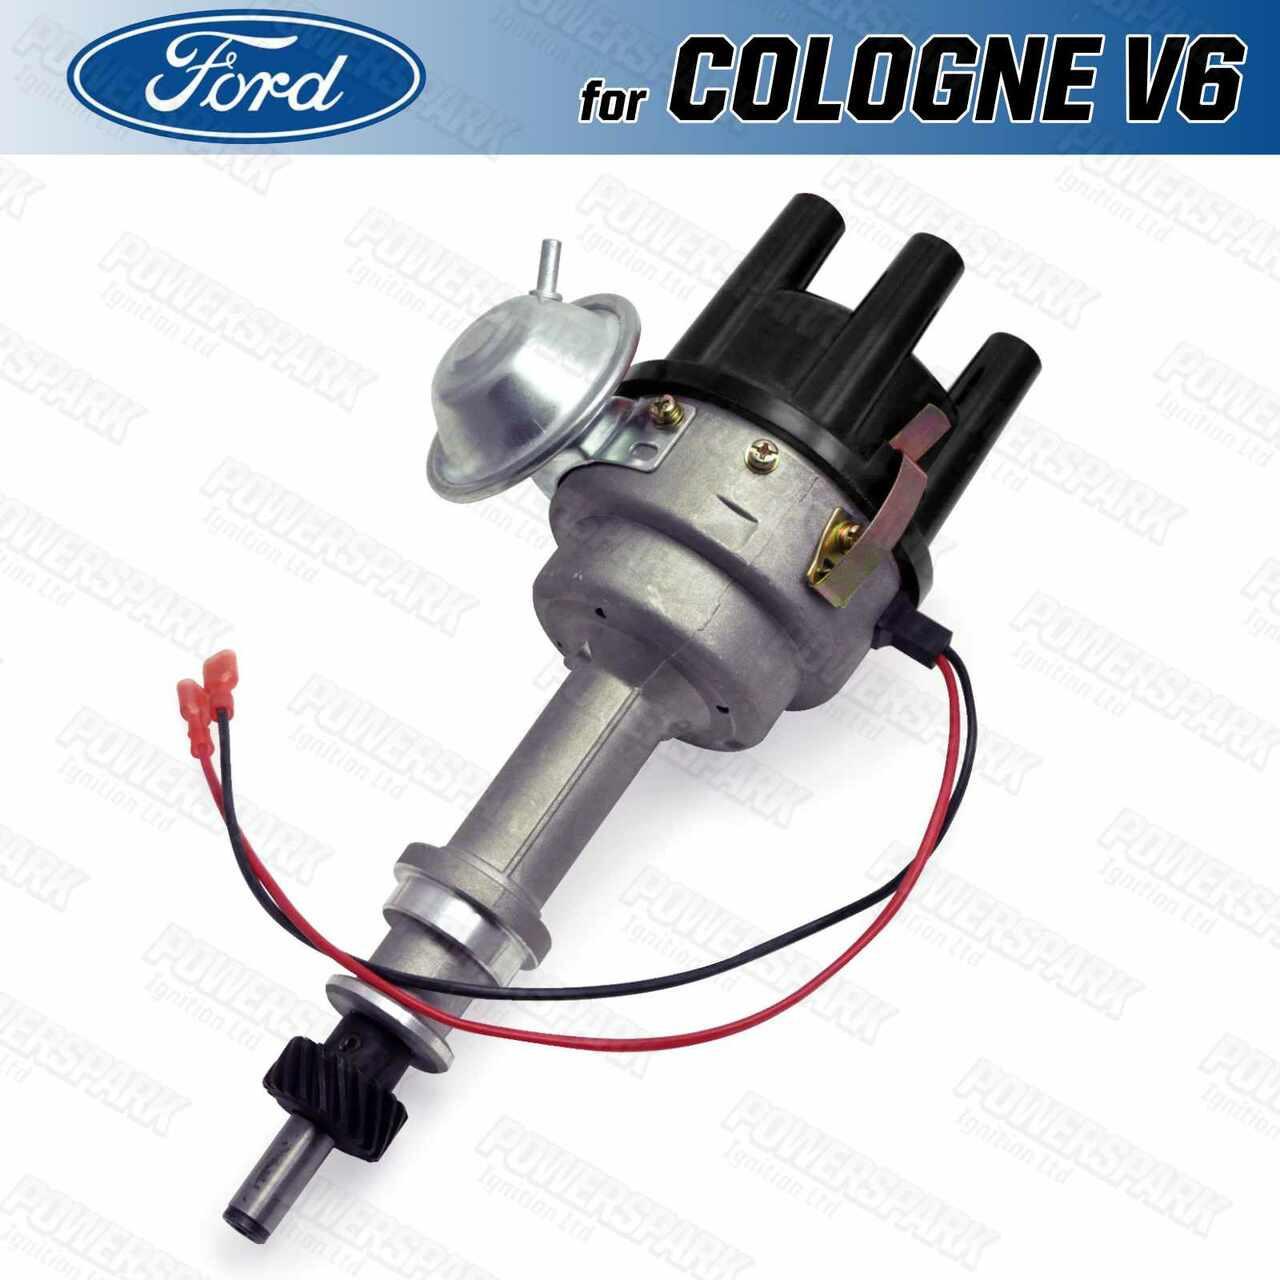 Powerspark Ford Cologne V6 Bosch Type Distributor